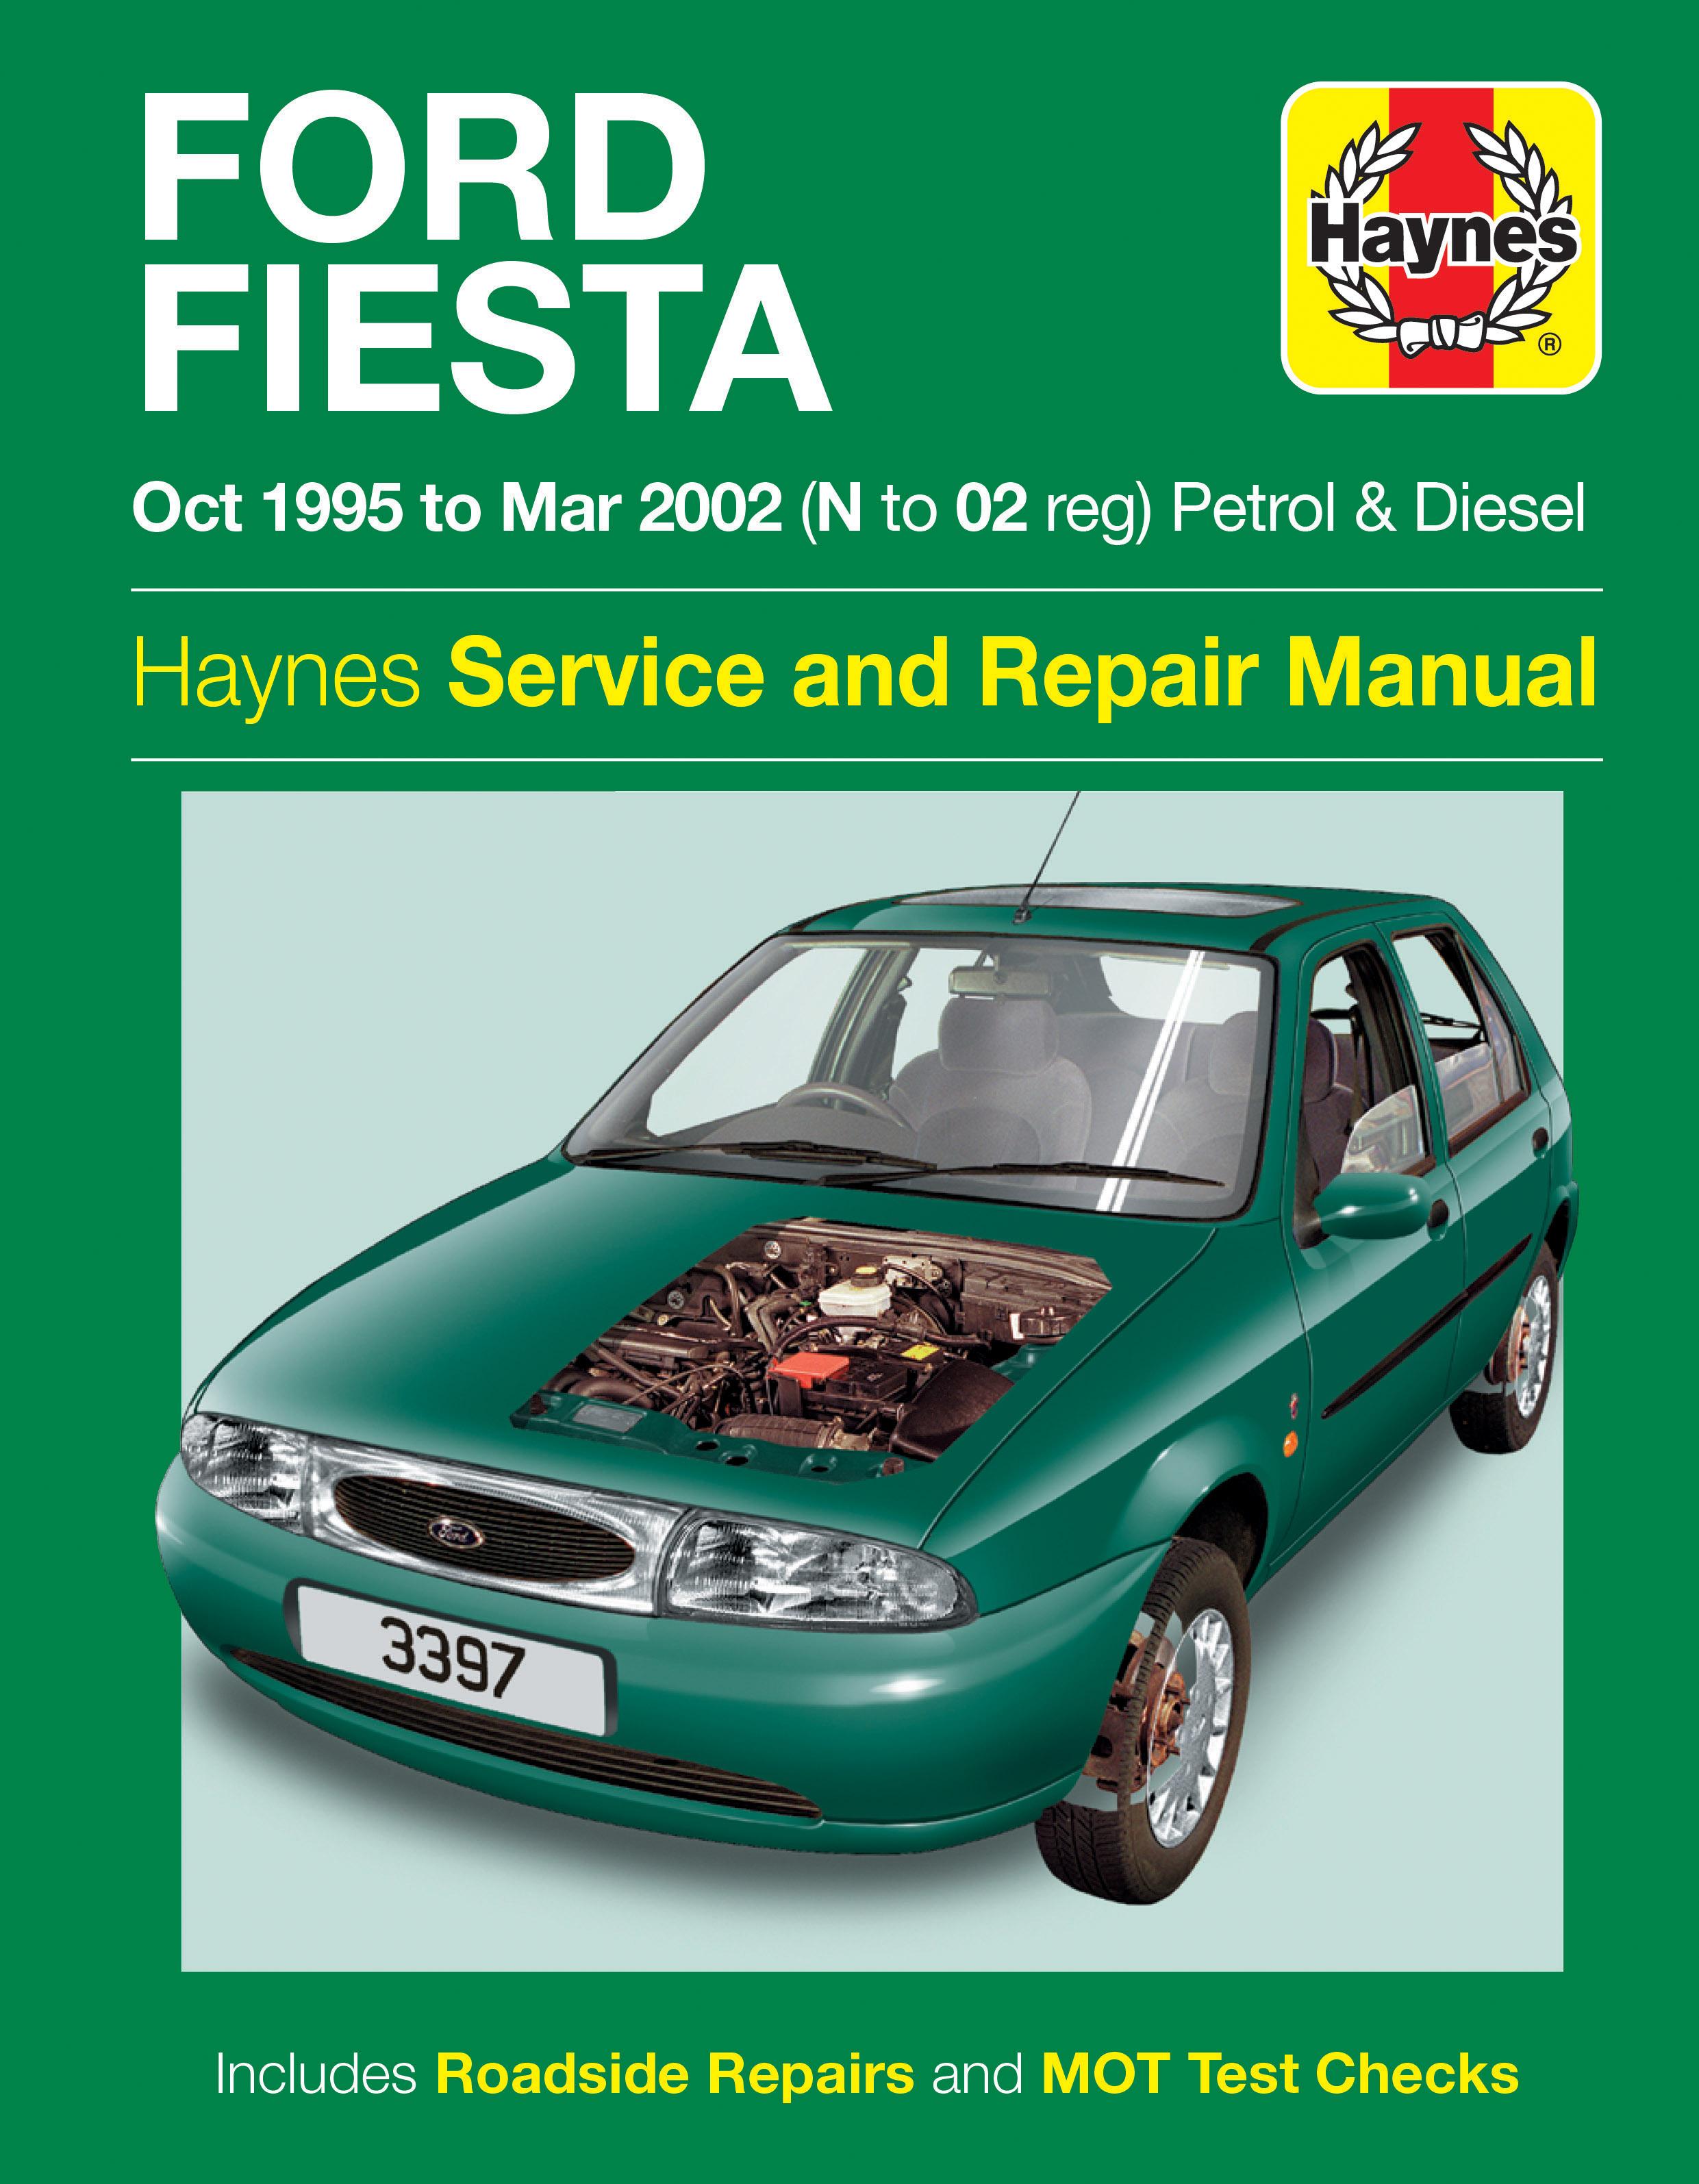 91 Ford Festiva Wiring Diagram Free Download Wiring Diagram